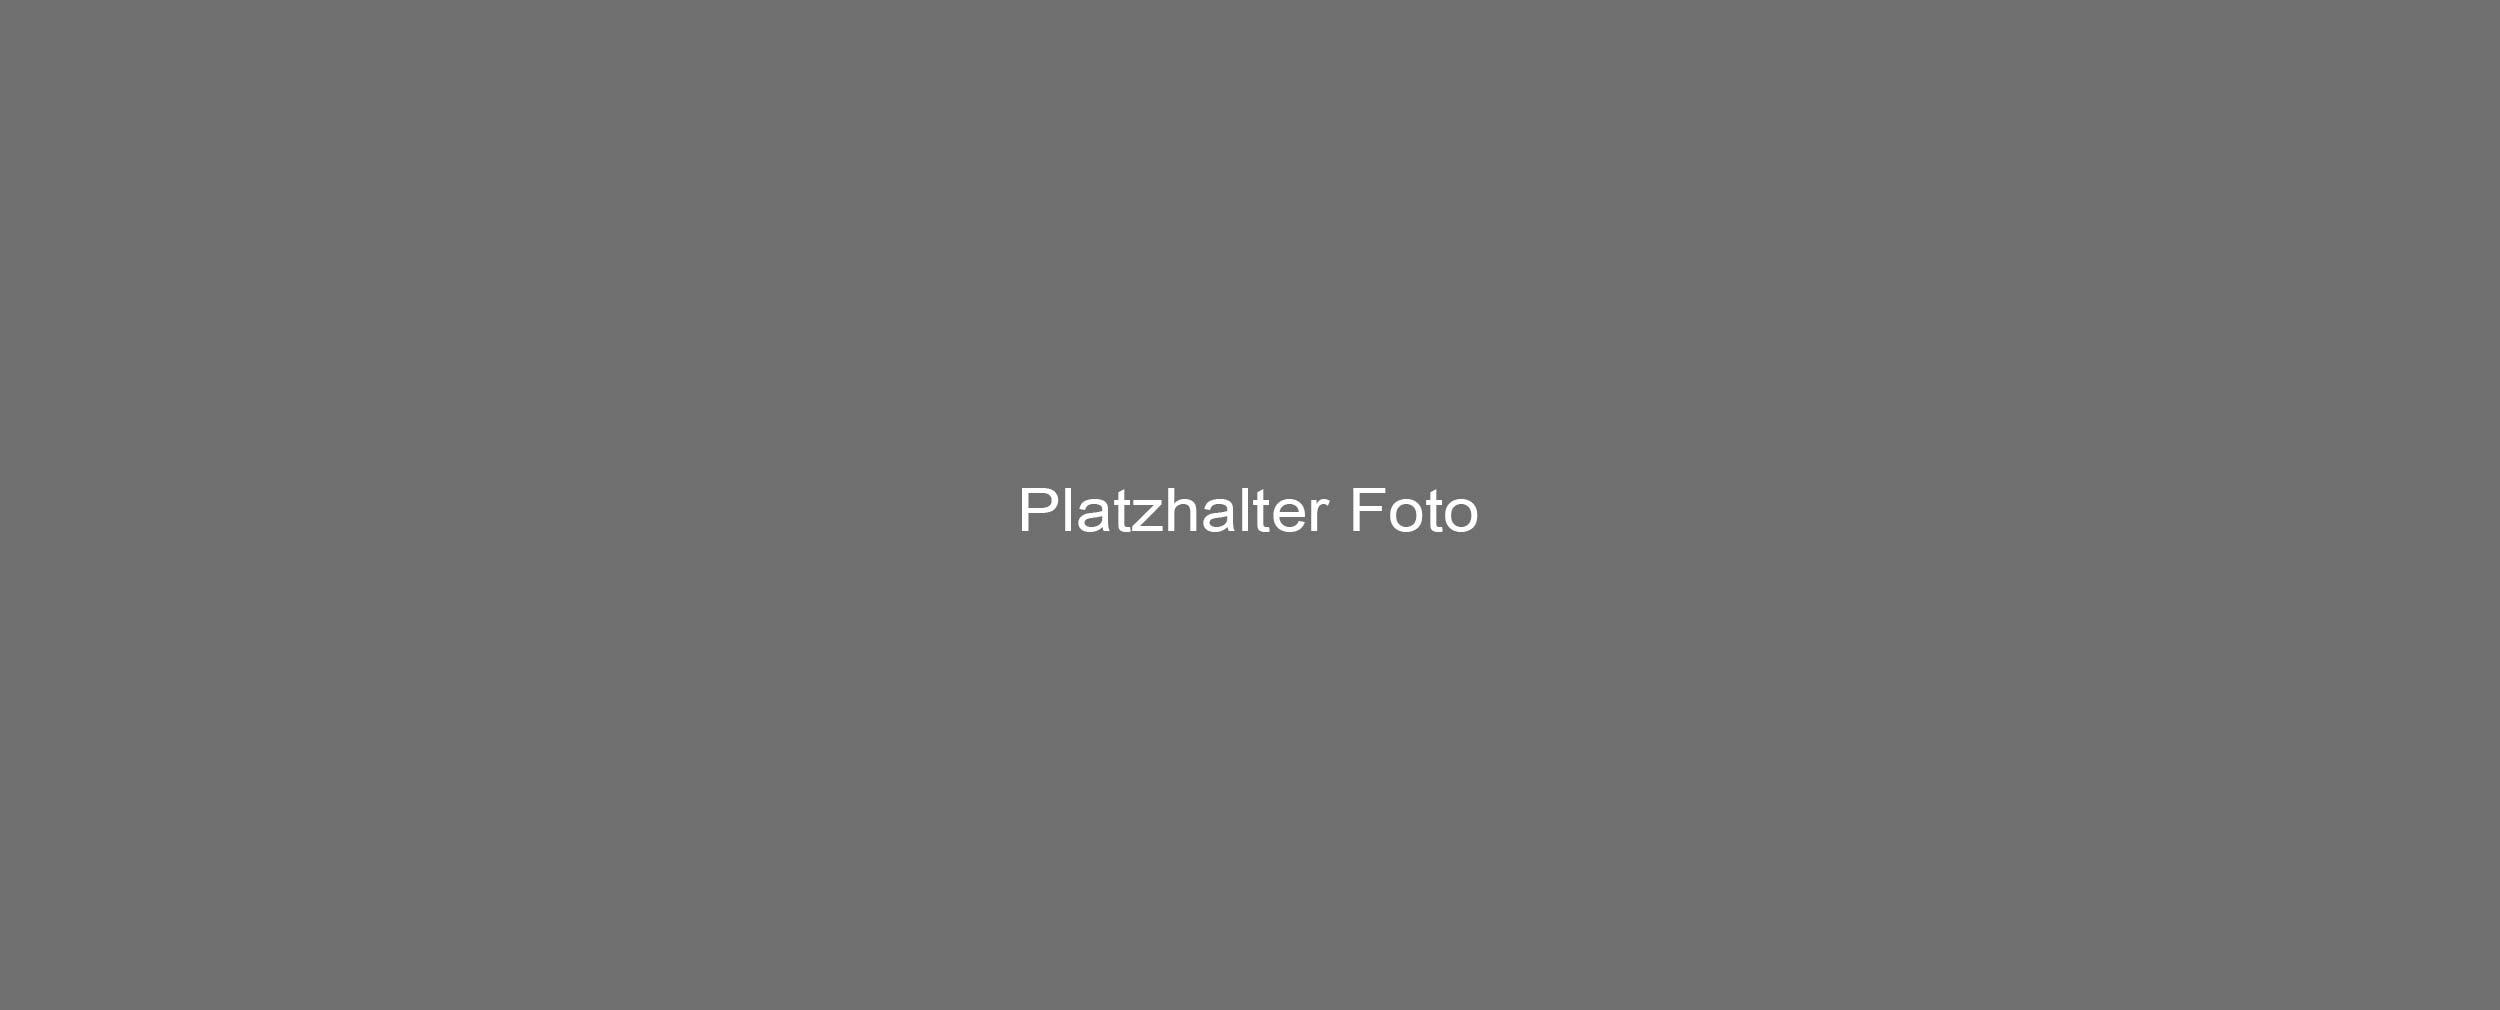 Sliderfotos-stadtapotheke-Platzhalter1